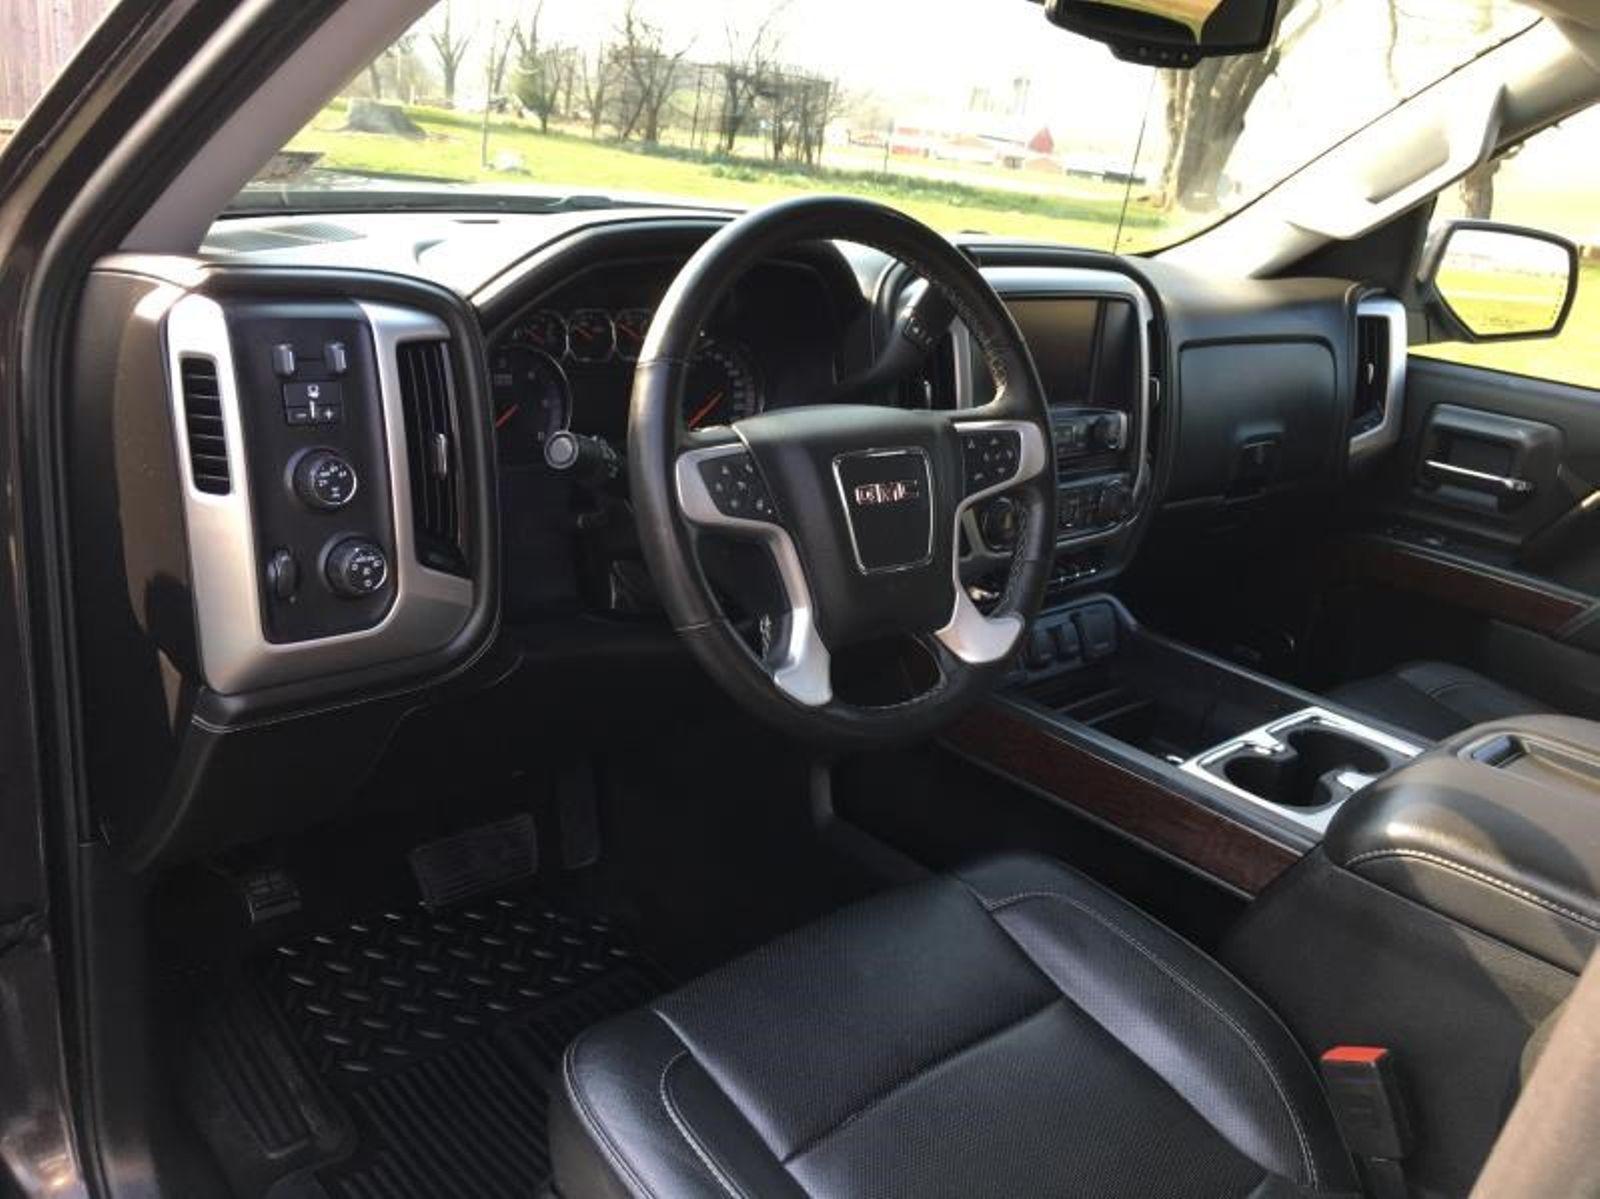 2015 Gmc Sierra 1500 Slt City Pa Pine Tree Motors Chevy Silverado Center Console In Ephrata